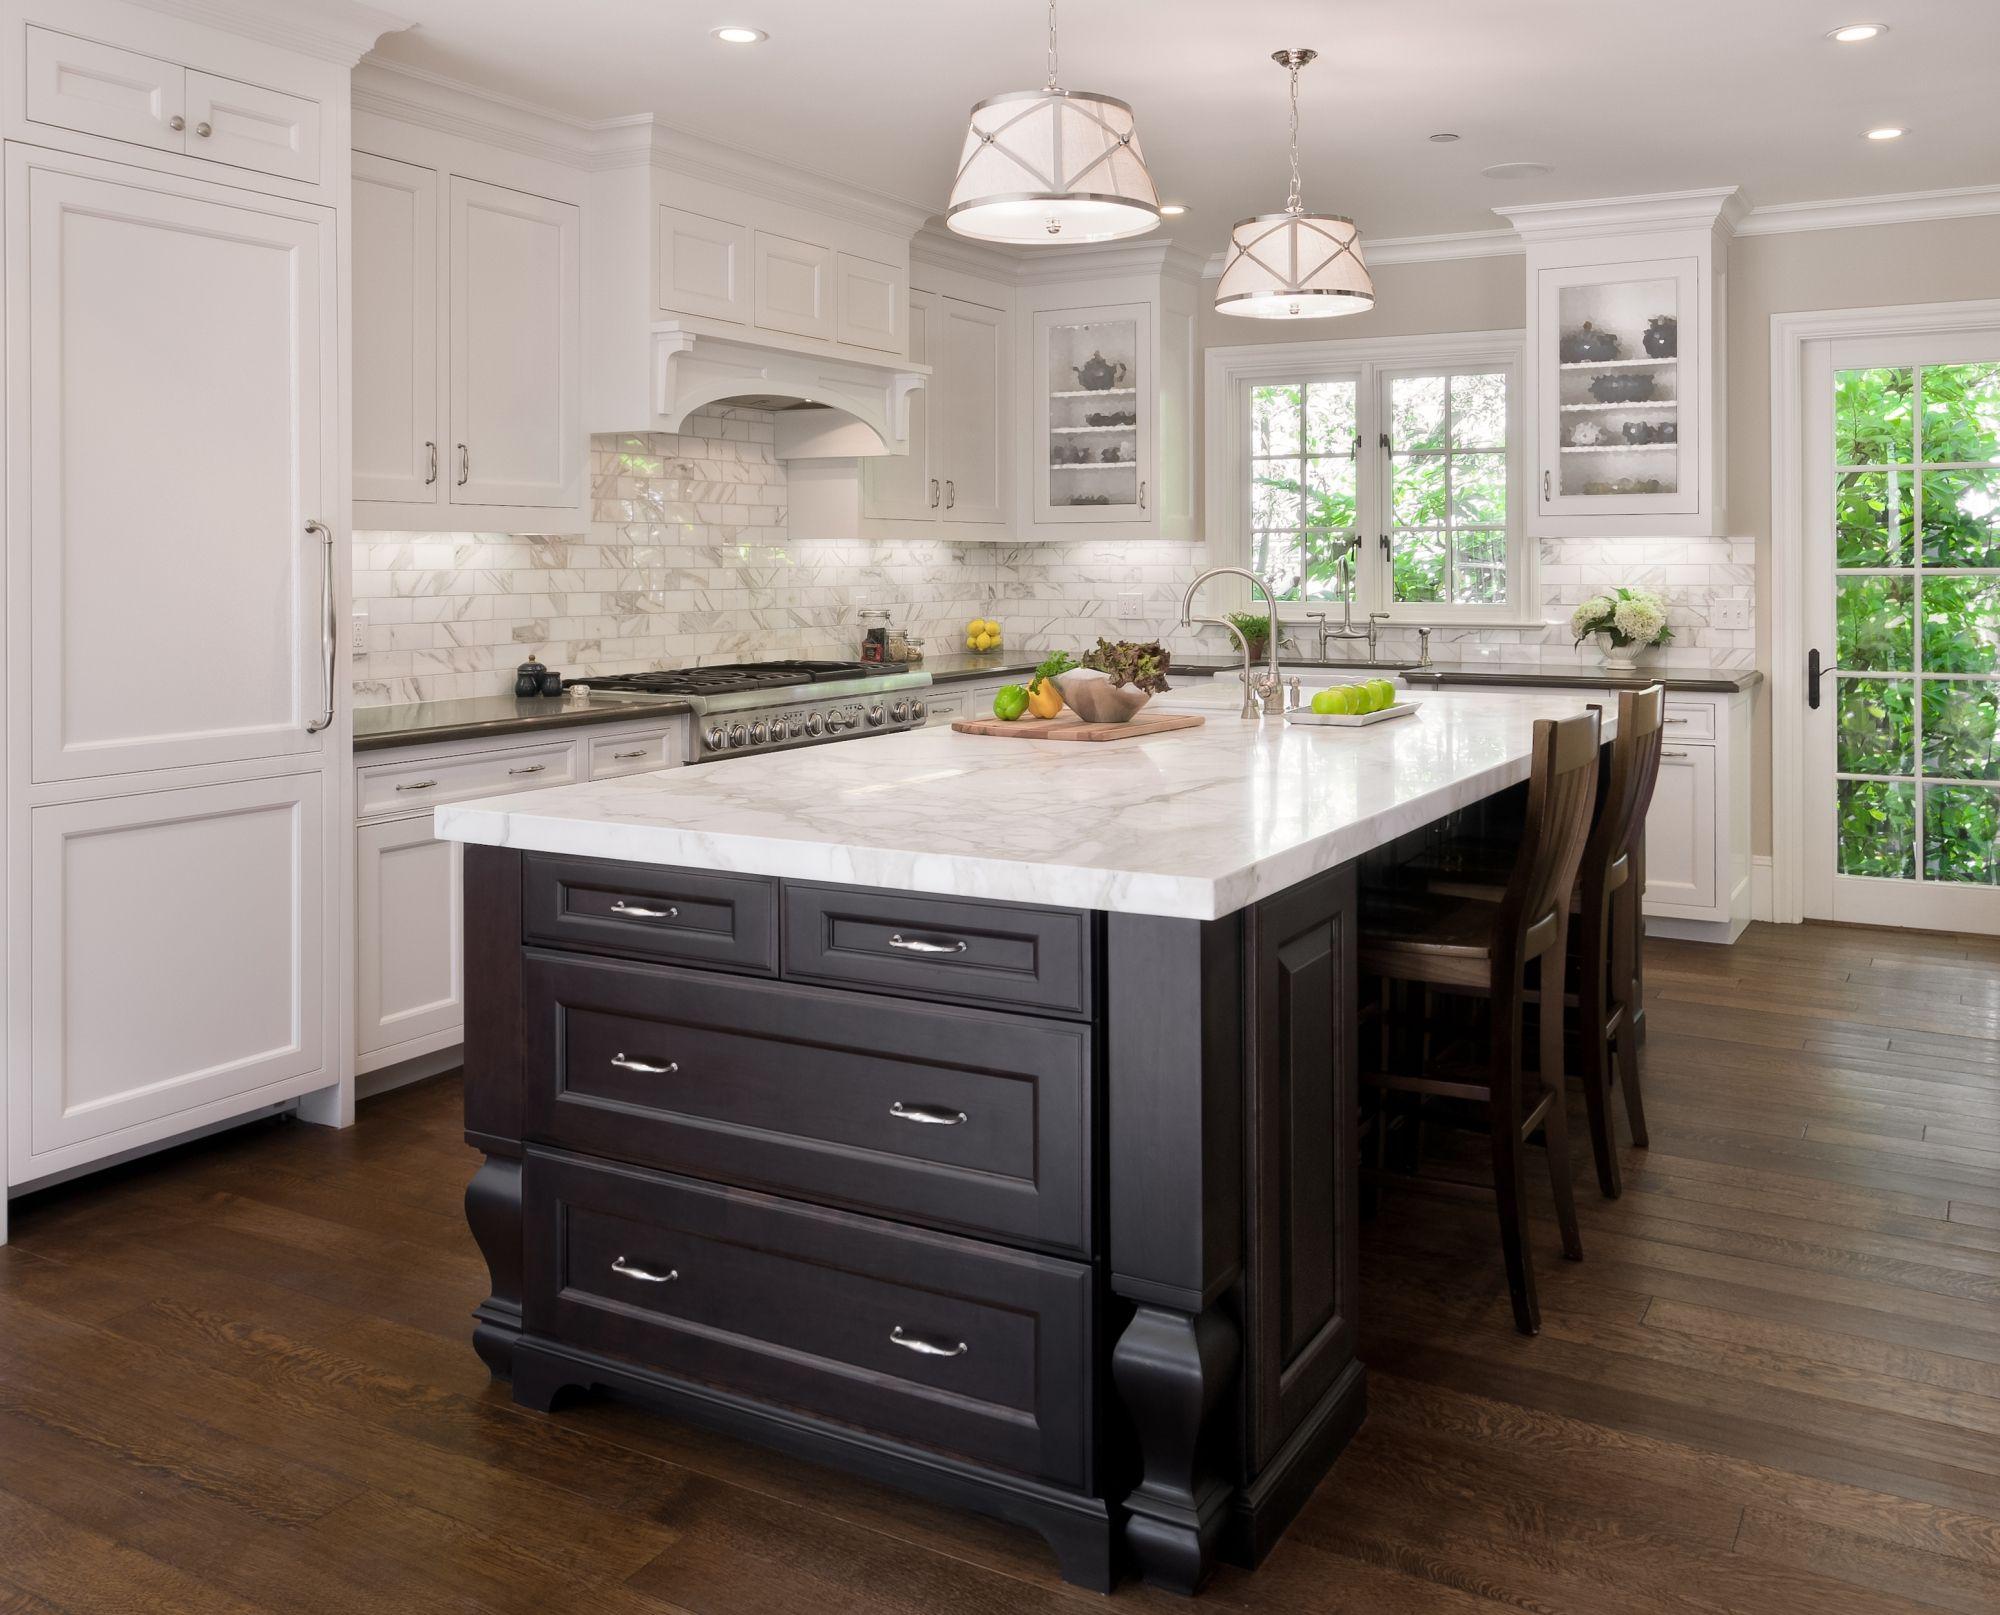 San Mateo Wood Mode Kitchen Island Kitchen Home Kitchens Kitchen Design